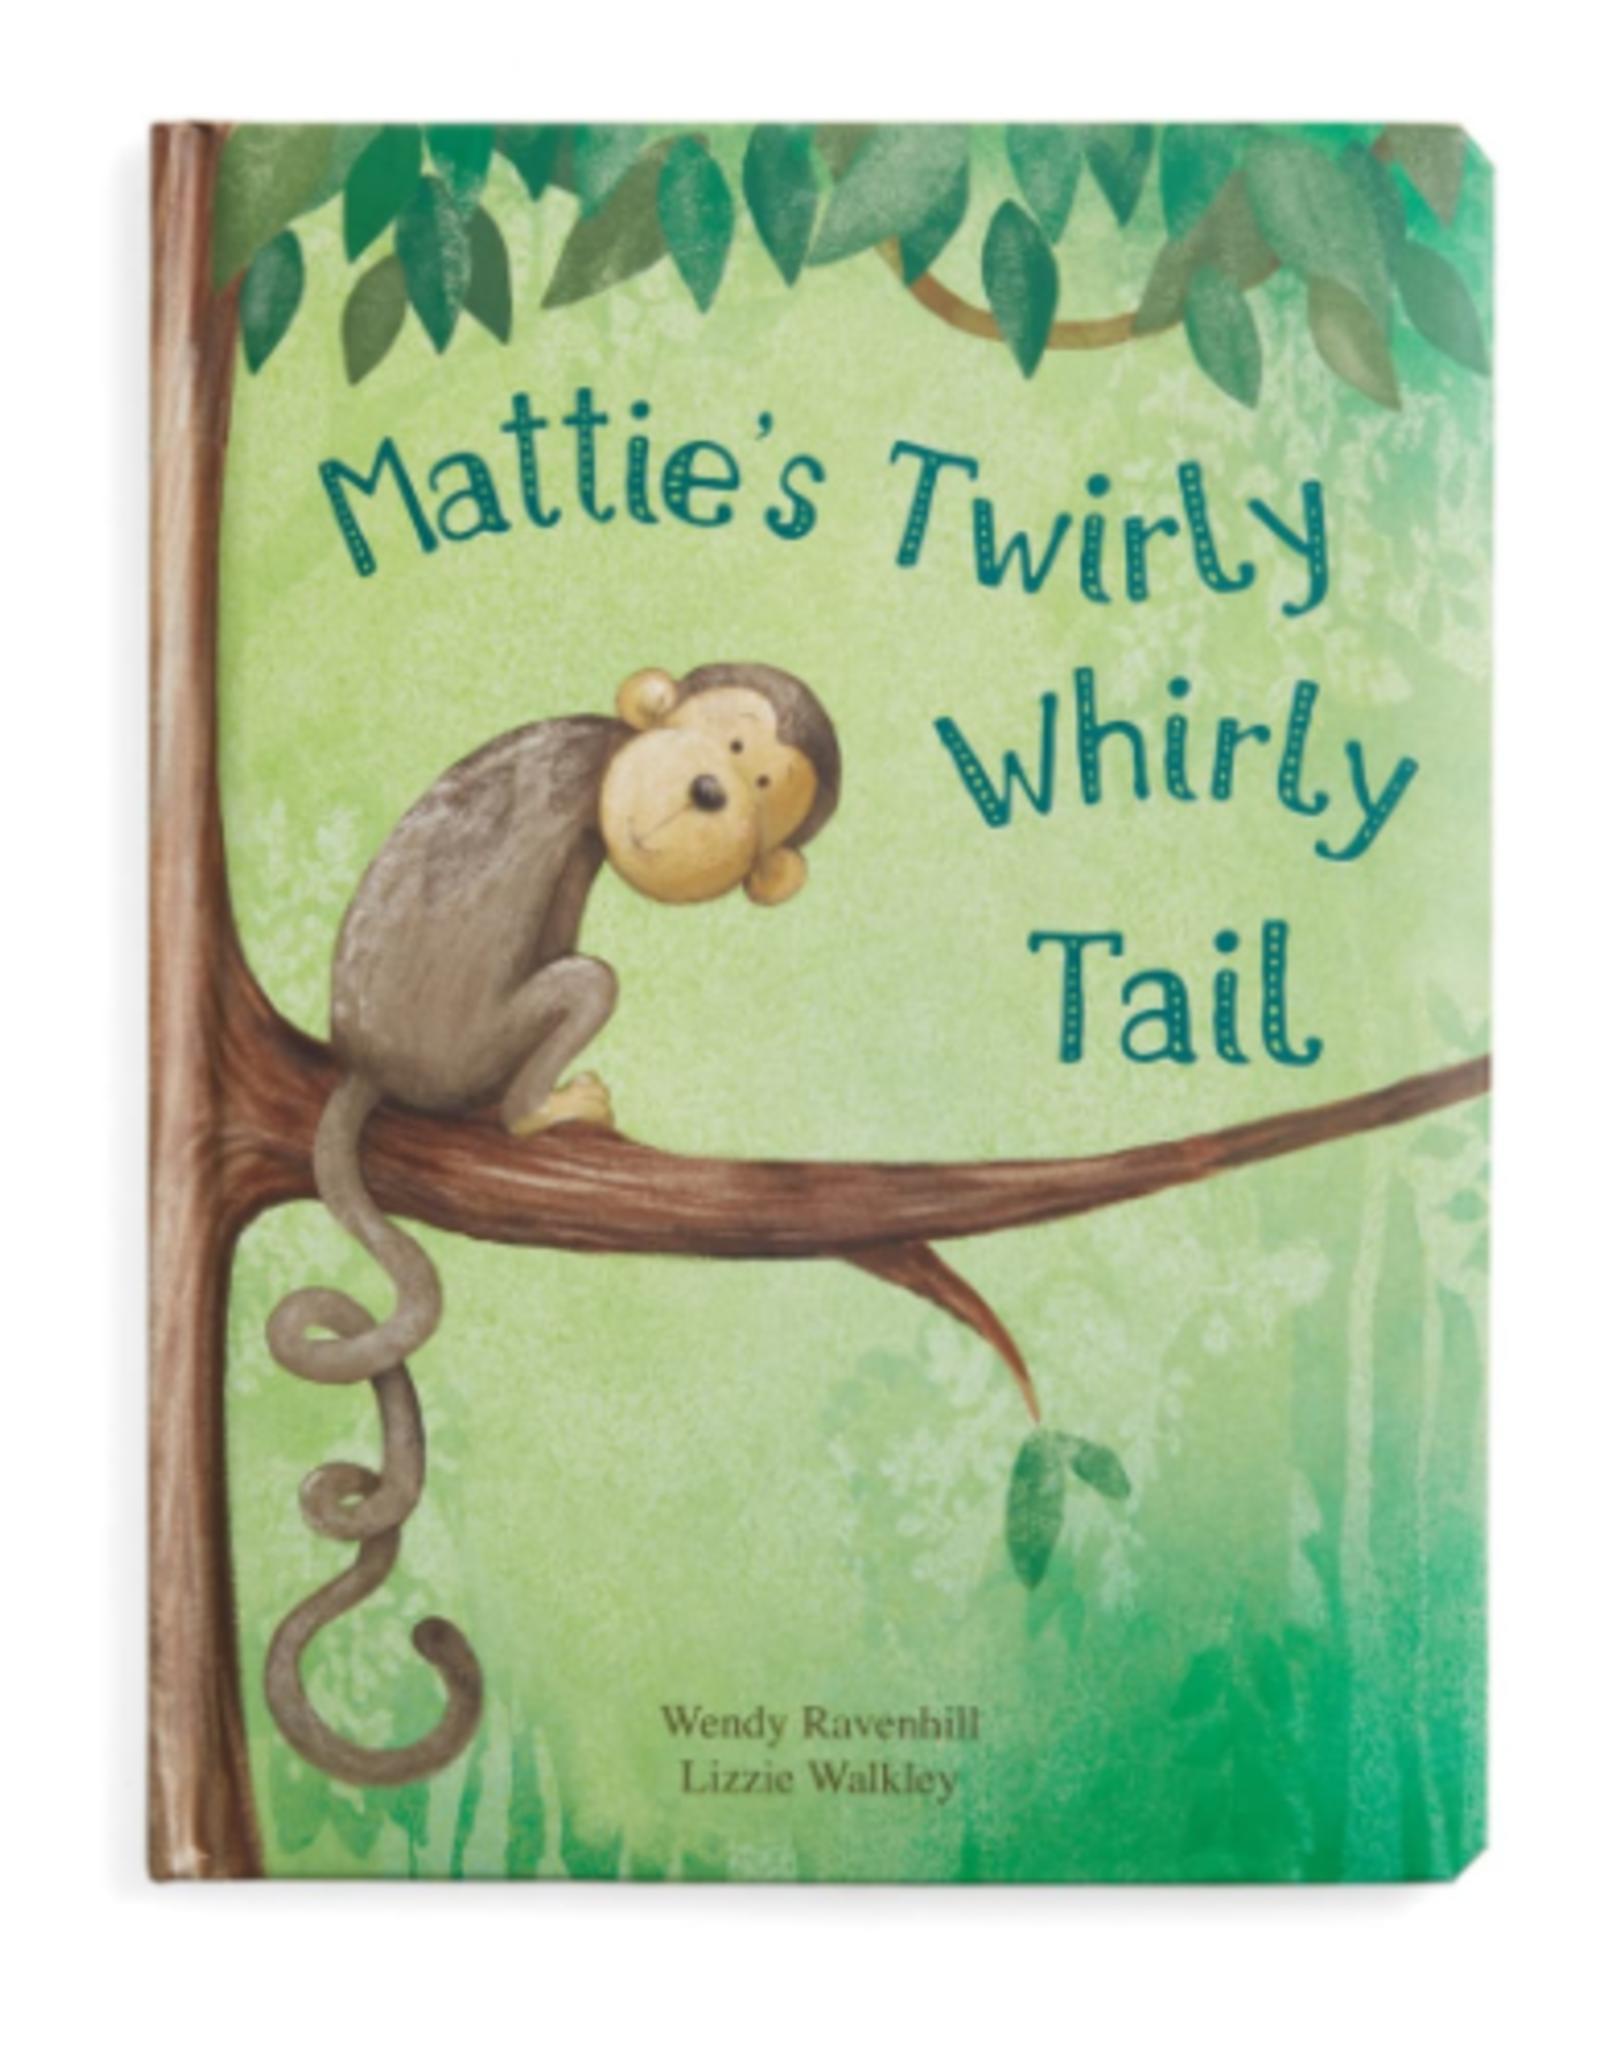 Jellycat Mattie's Twirly Whirly Tail